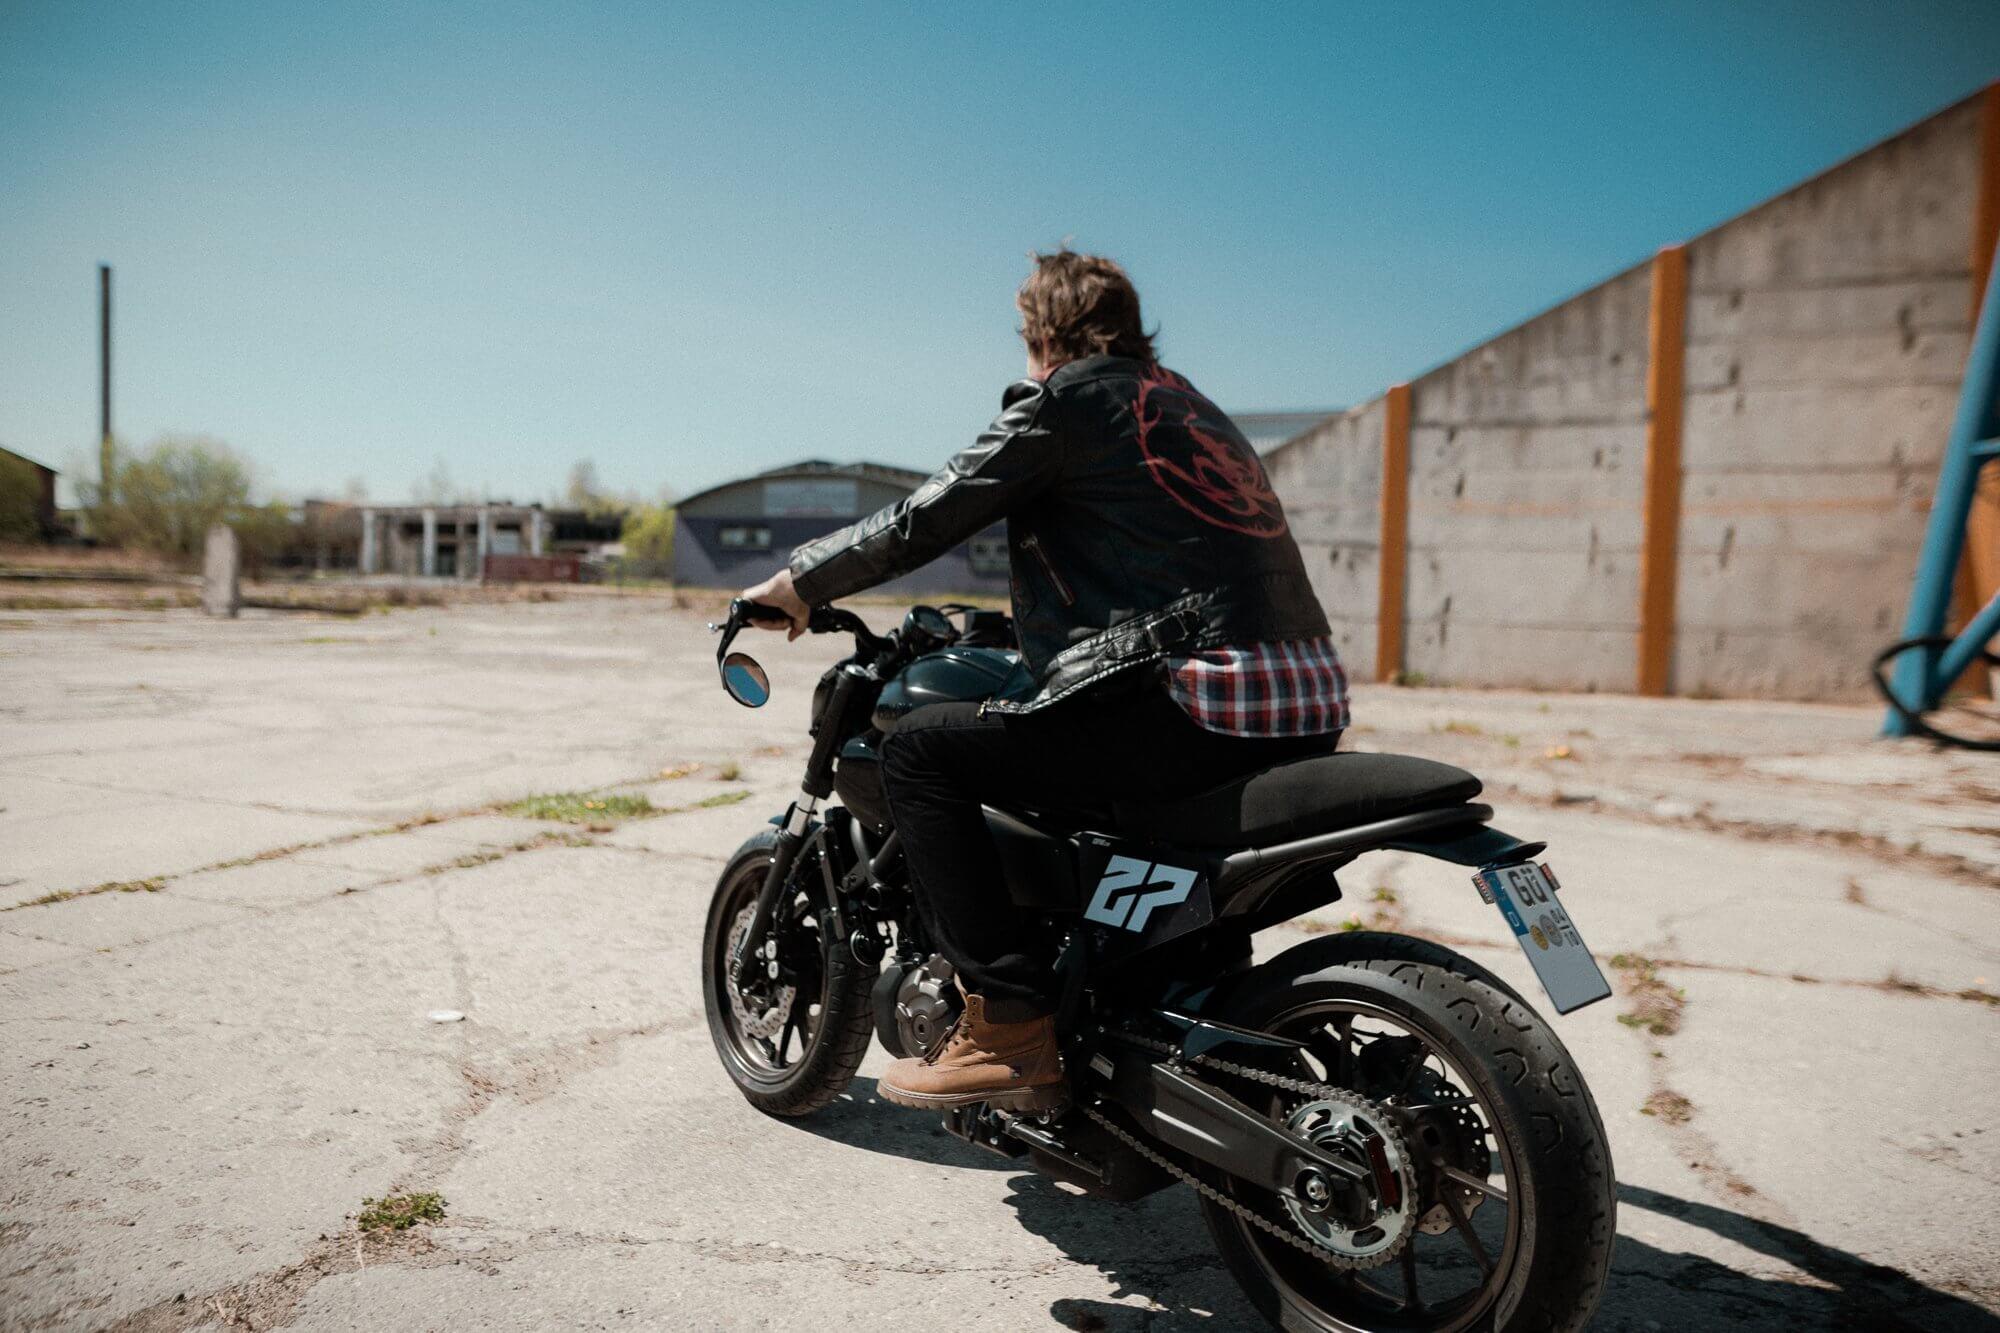 xsr700 custom bike